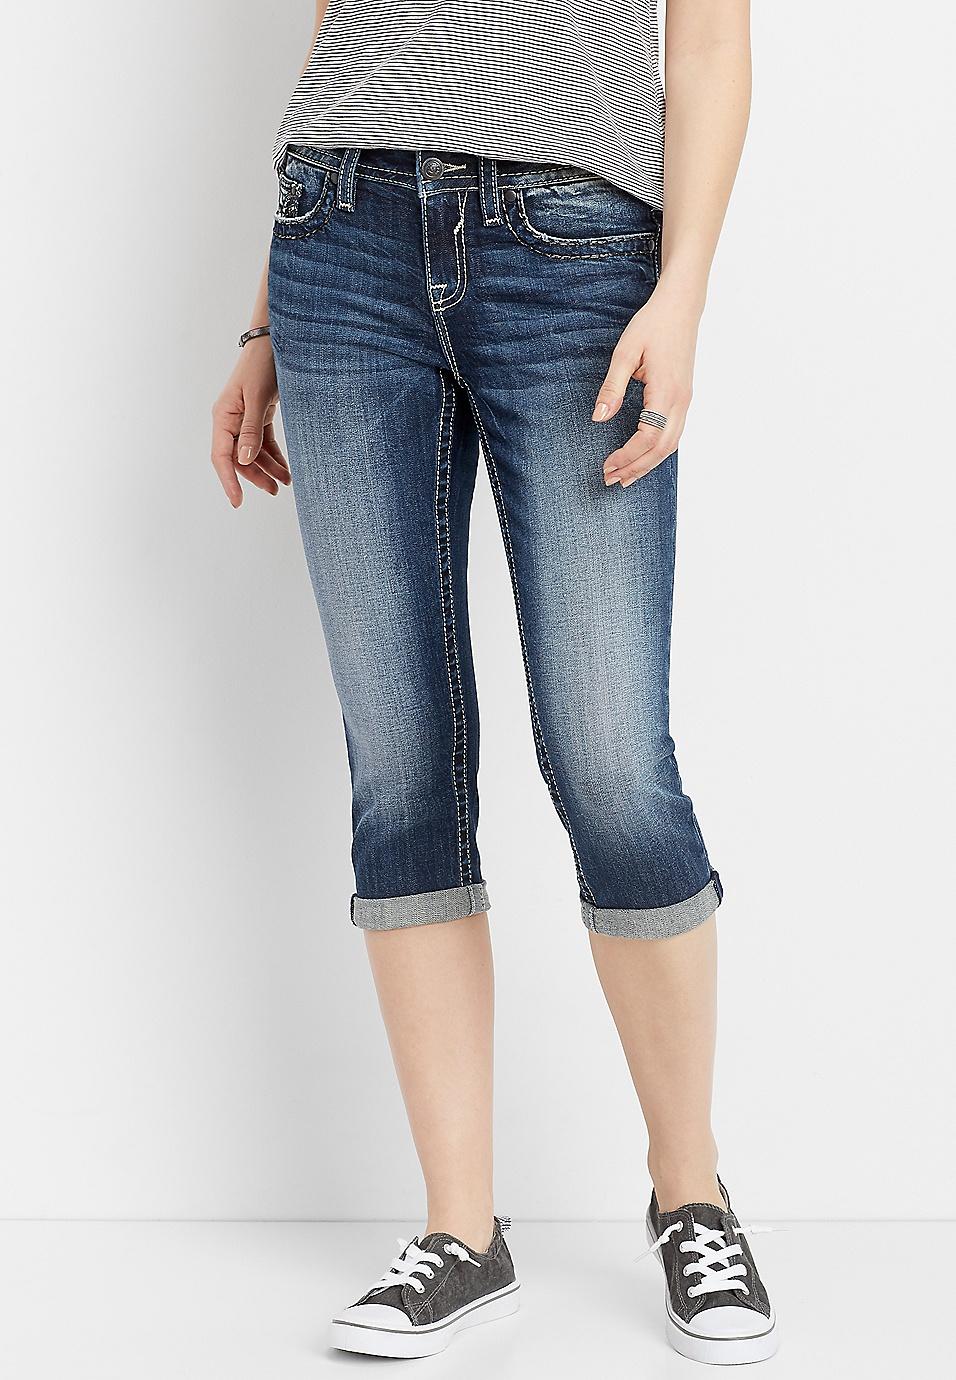 0eac7d9796f Vigoss® dark embellished flap pocket capri